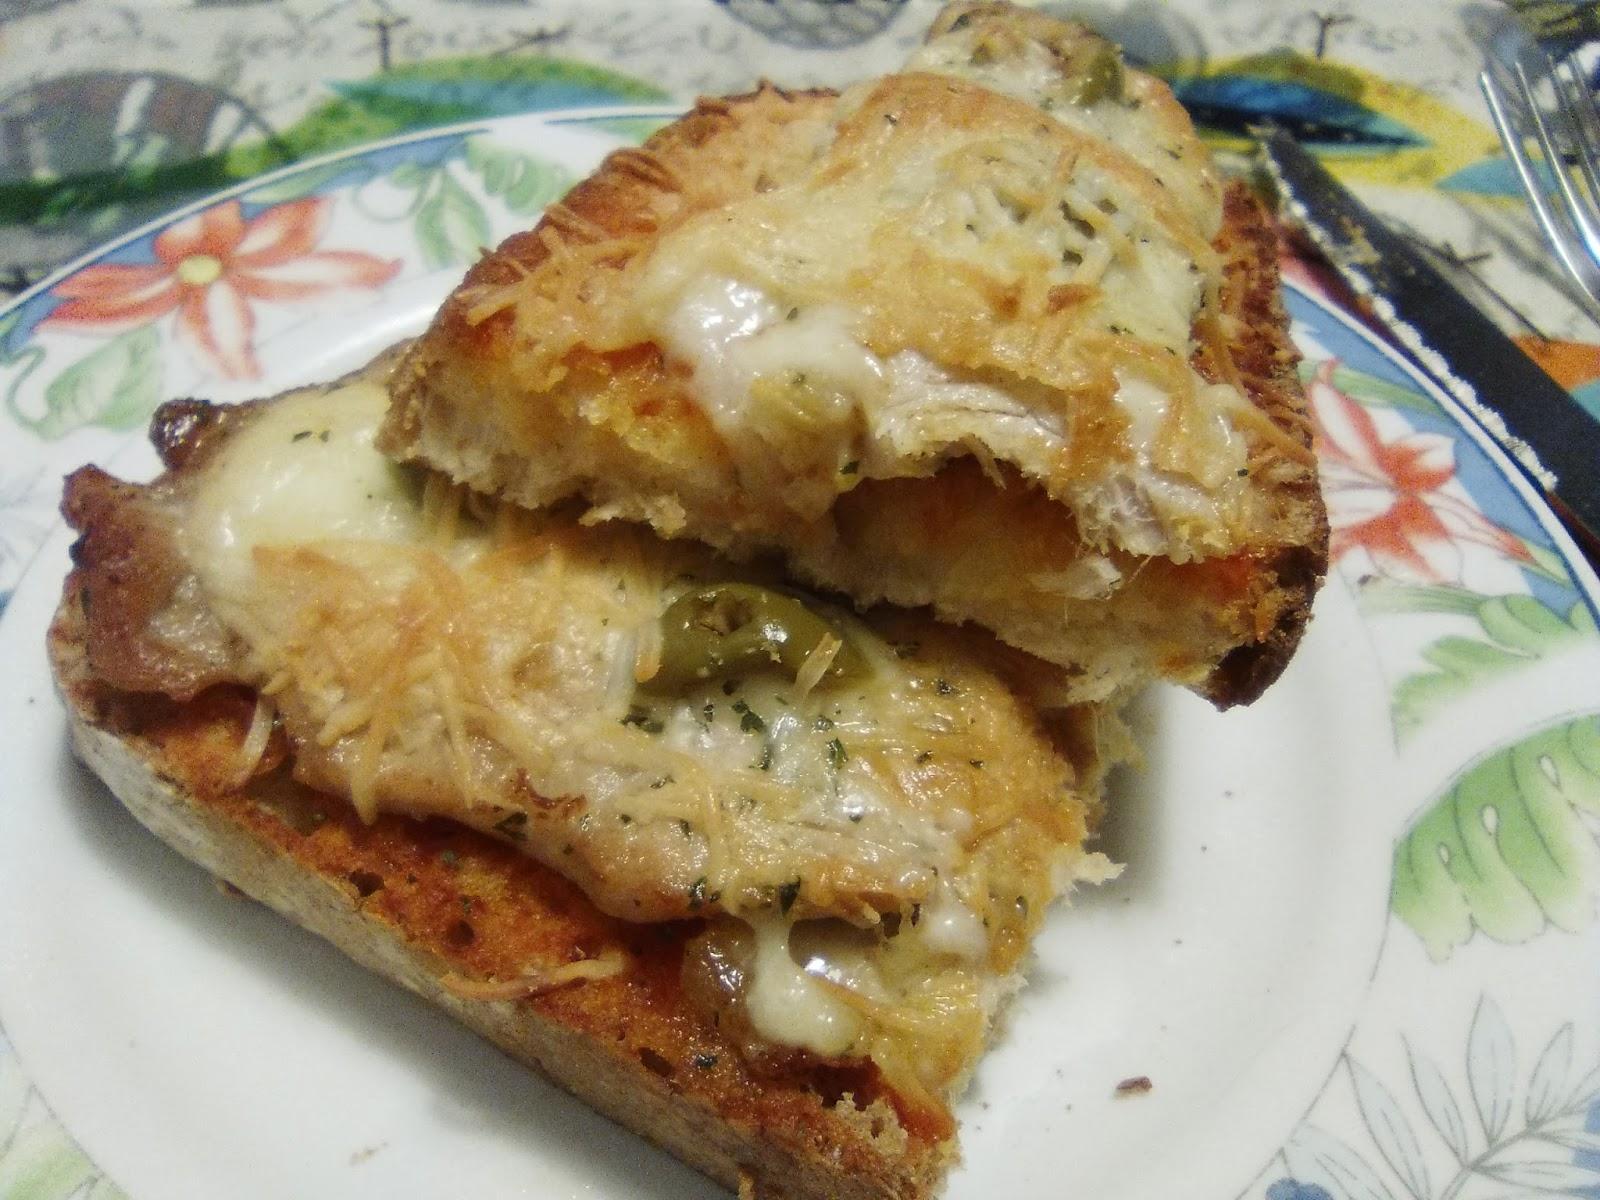 Cocina con denise torrada de lomo con queso al horno - Cocina al horno ...